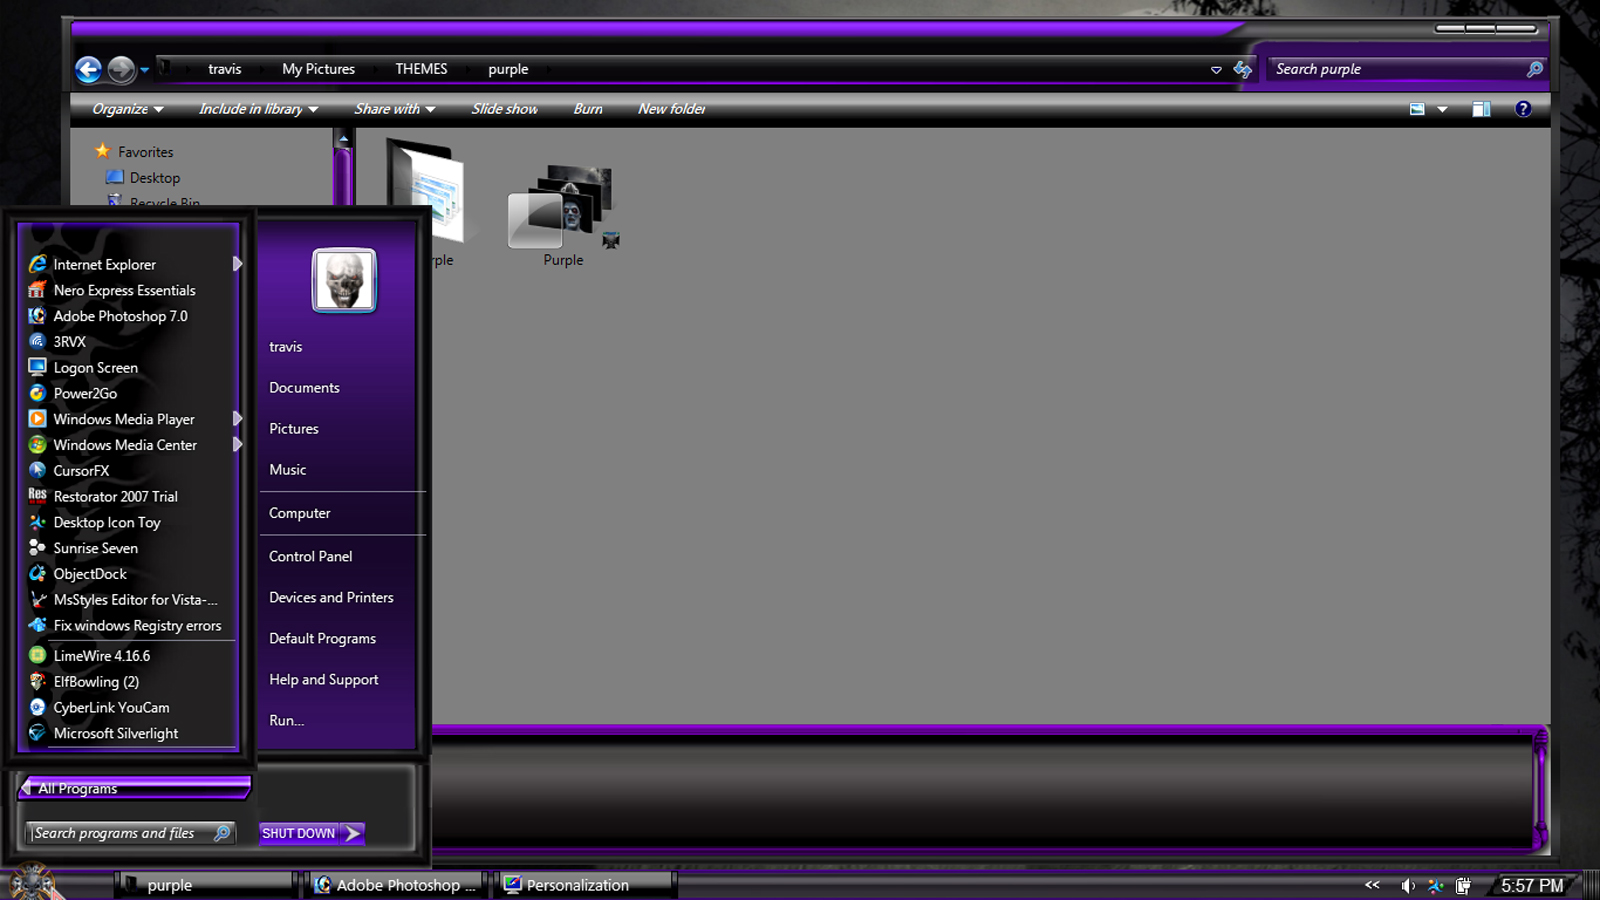 Download Windows 7 Purple wallpaper HD Widescreen Wallpaper from ...